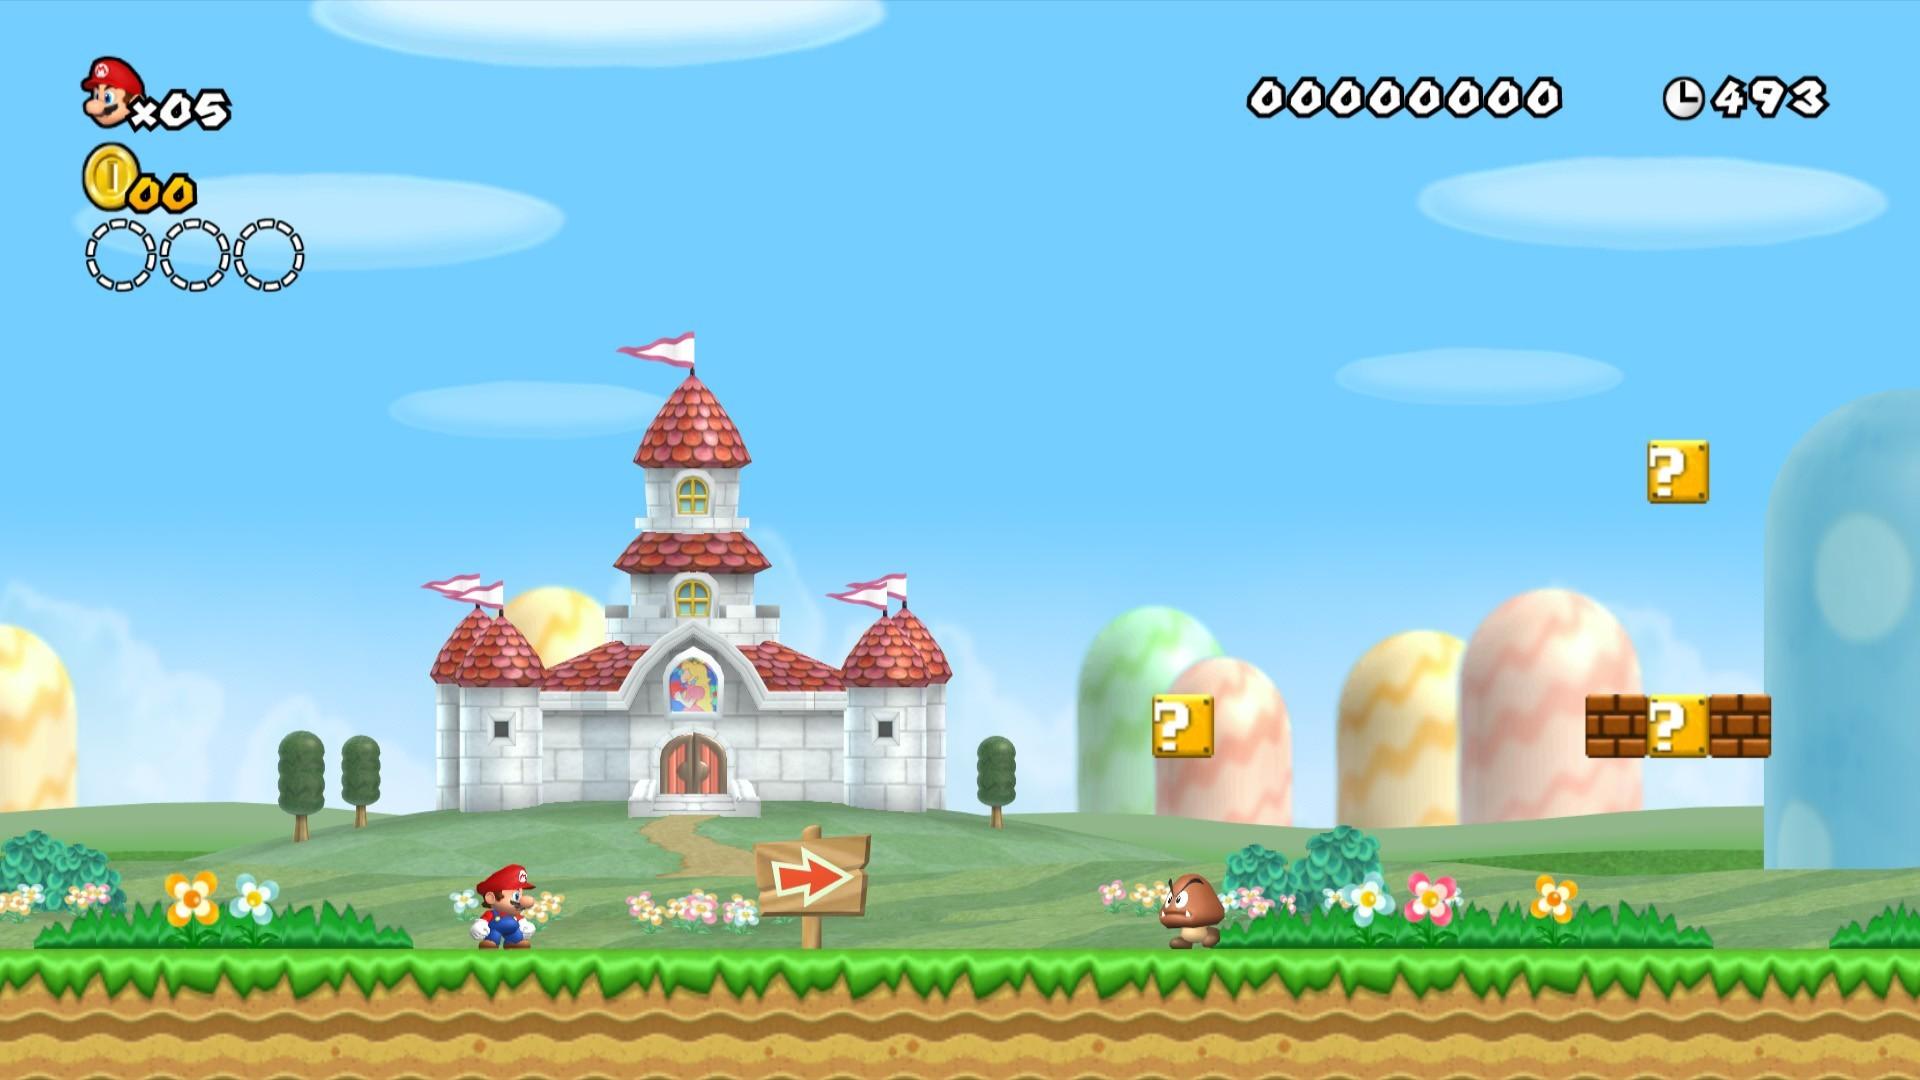 Video Game – New Super Mario Bros. Wii Wallpaper